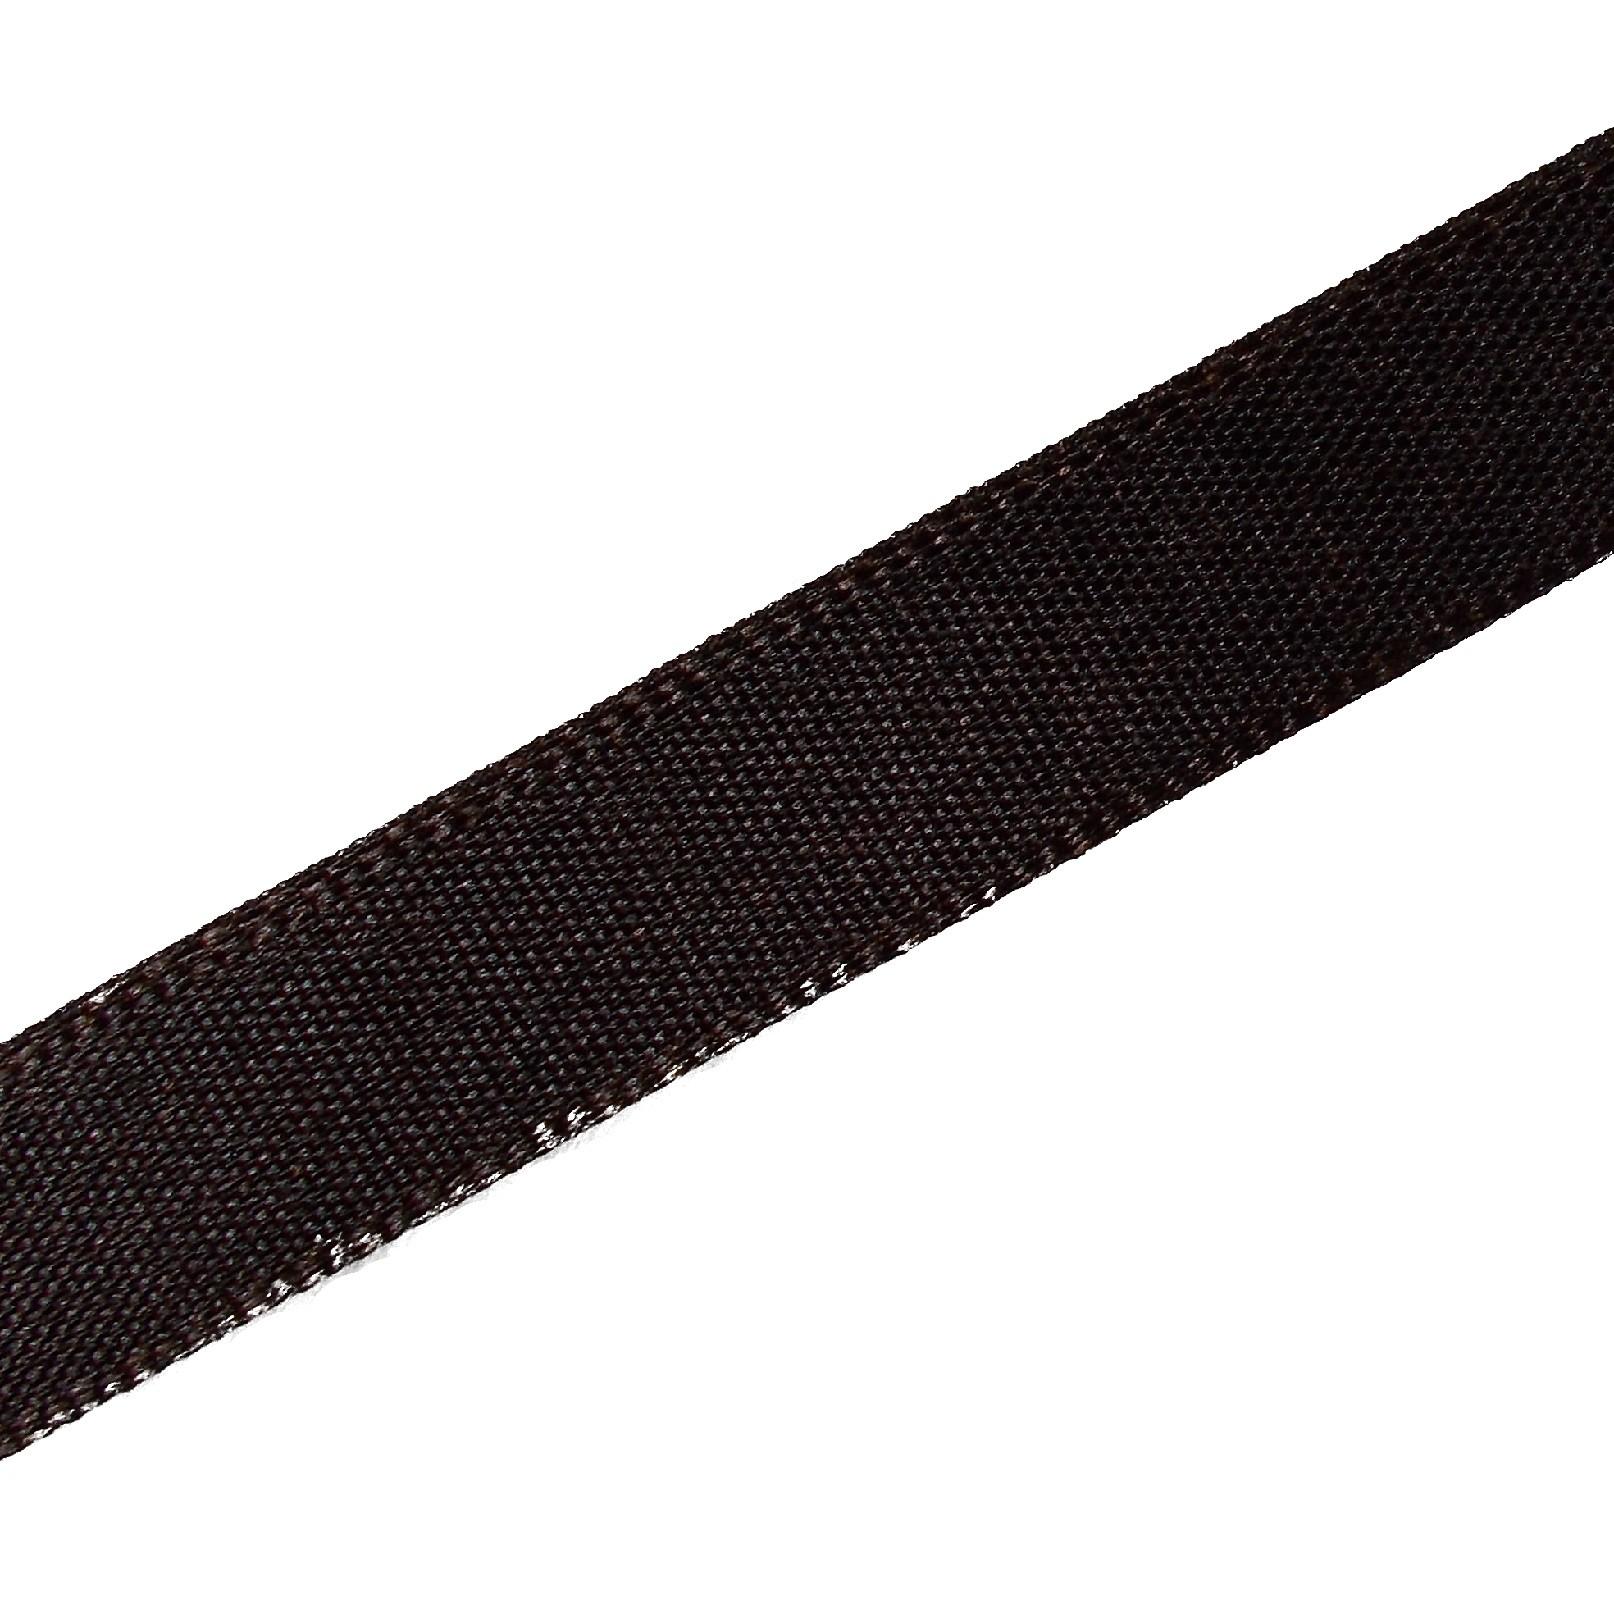 Berisfords Seam Binding Polyester Ribbon Tape 12mm wide Brown 3 metre length